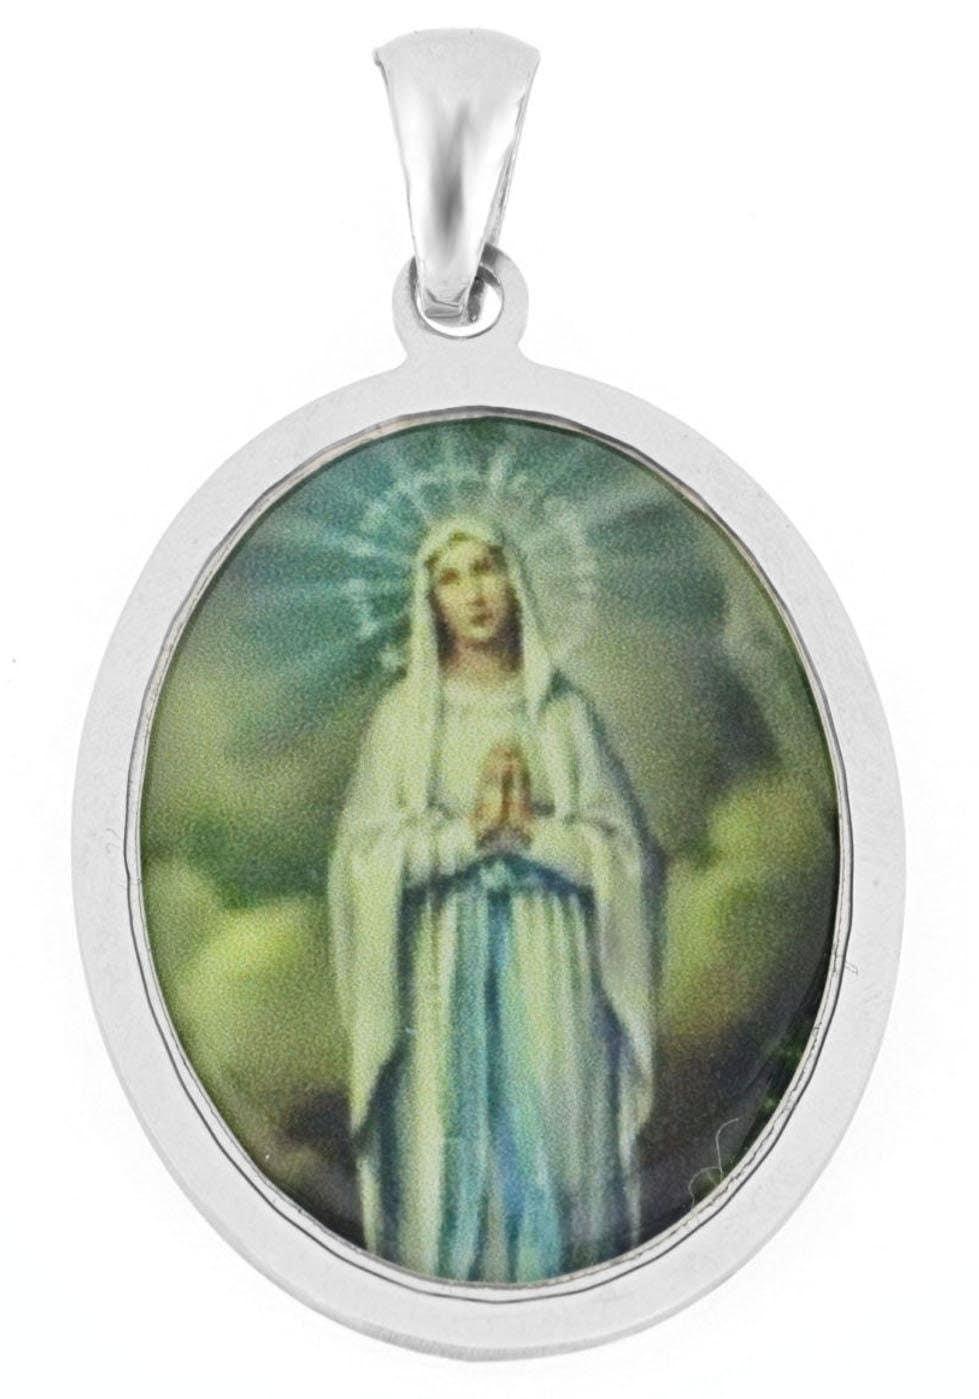 Firetti Kettenanhänger Heilige Maria glänzend rhodiniert ovale Form | Schmuck > Halsketten > Kettenanhänger | Firetti